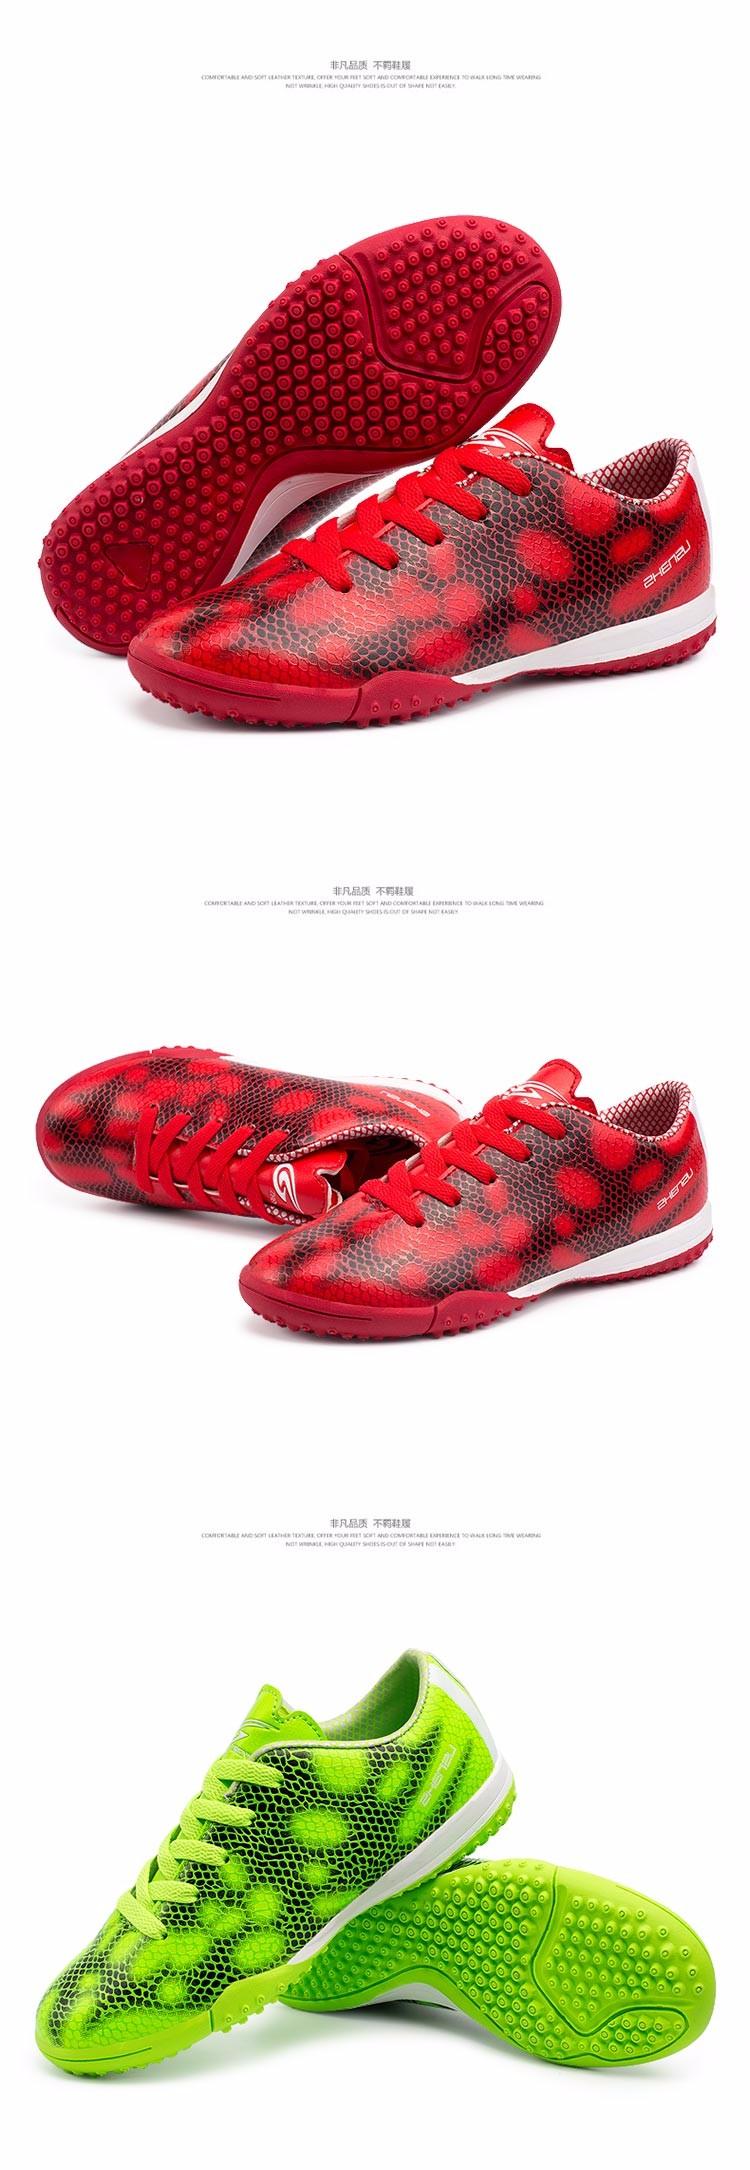 ZHENZU Football Boots Superfly Original Soccer Shoes Cleats Kids Teenagers Training AG HG TF voetbalschoenen chuteira futebol 2